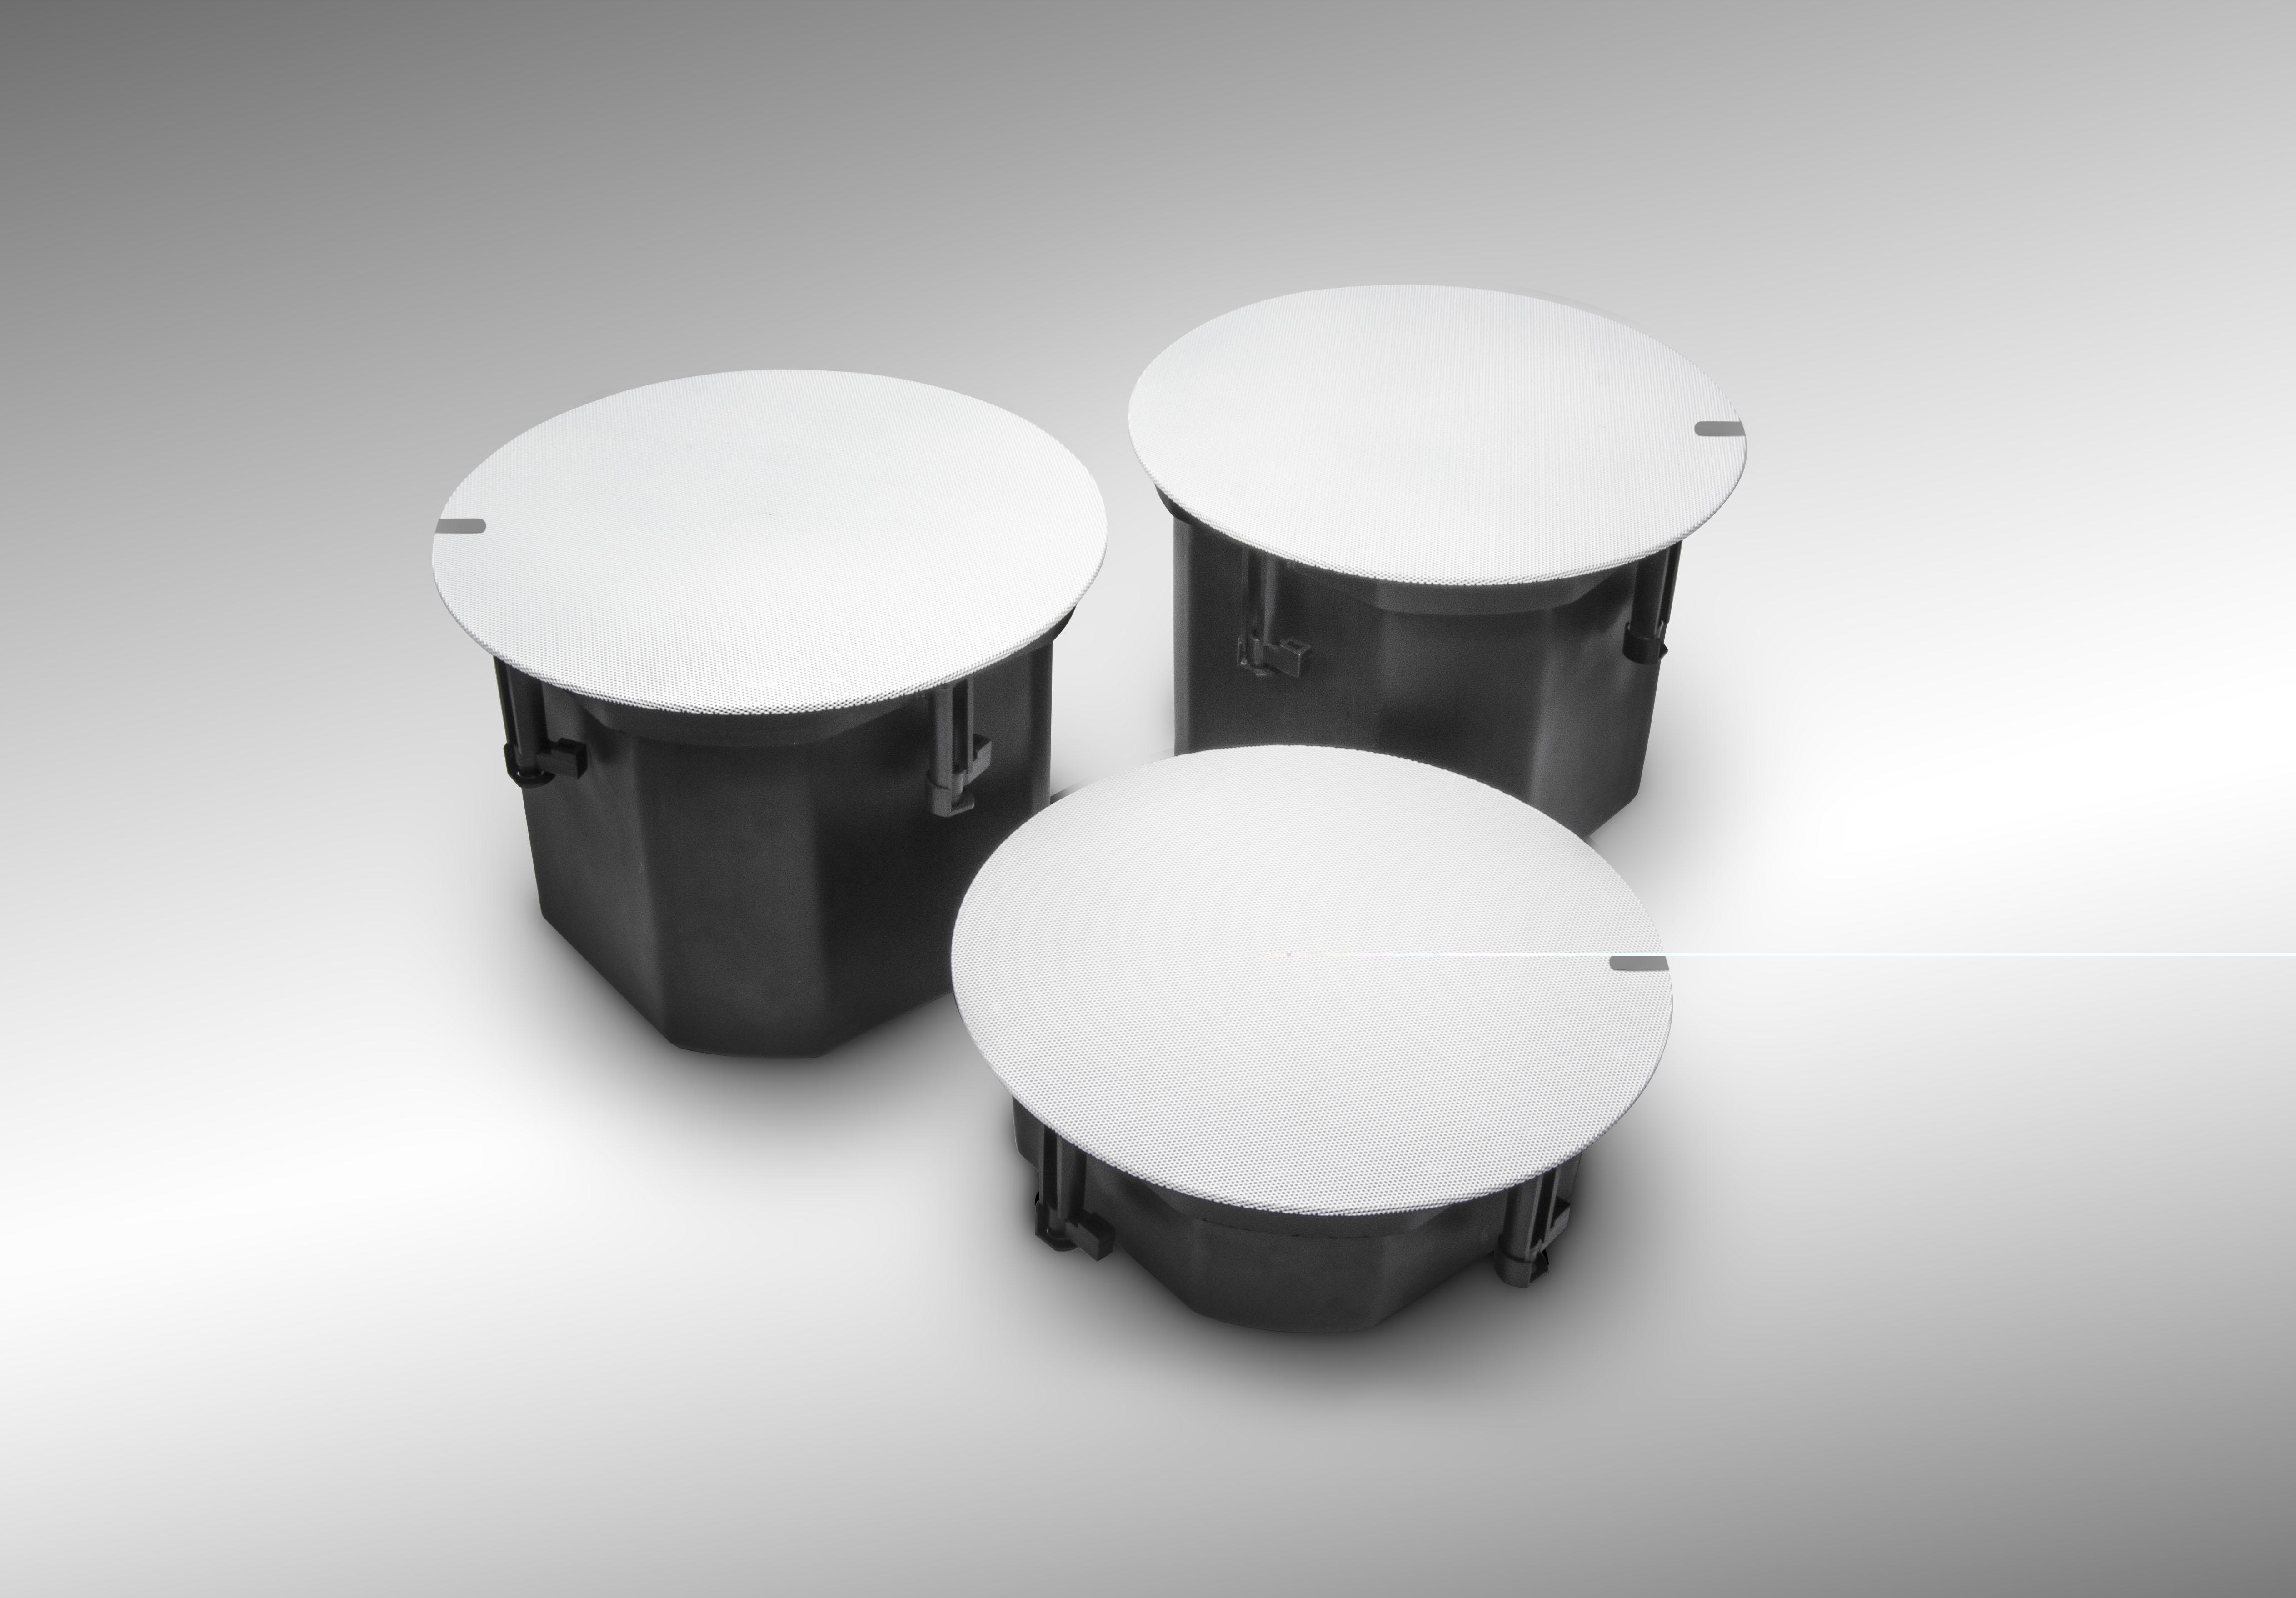 Cloud CS-C Series Speakers - Now Shipping!